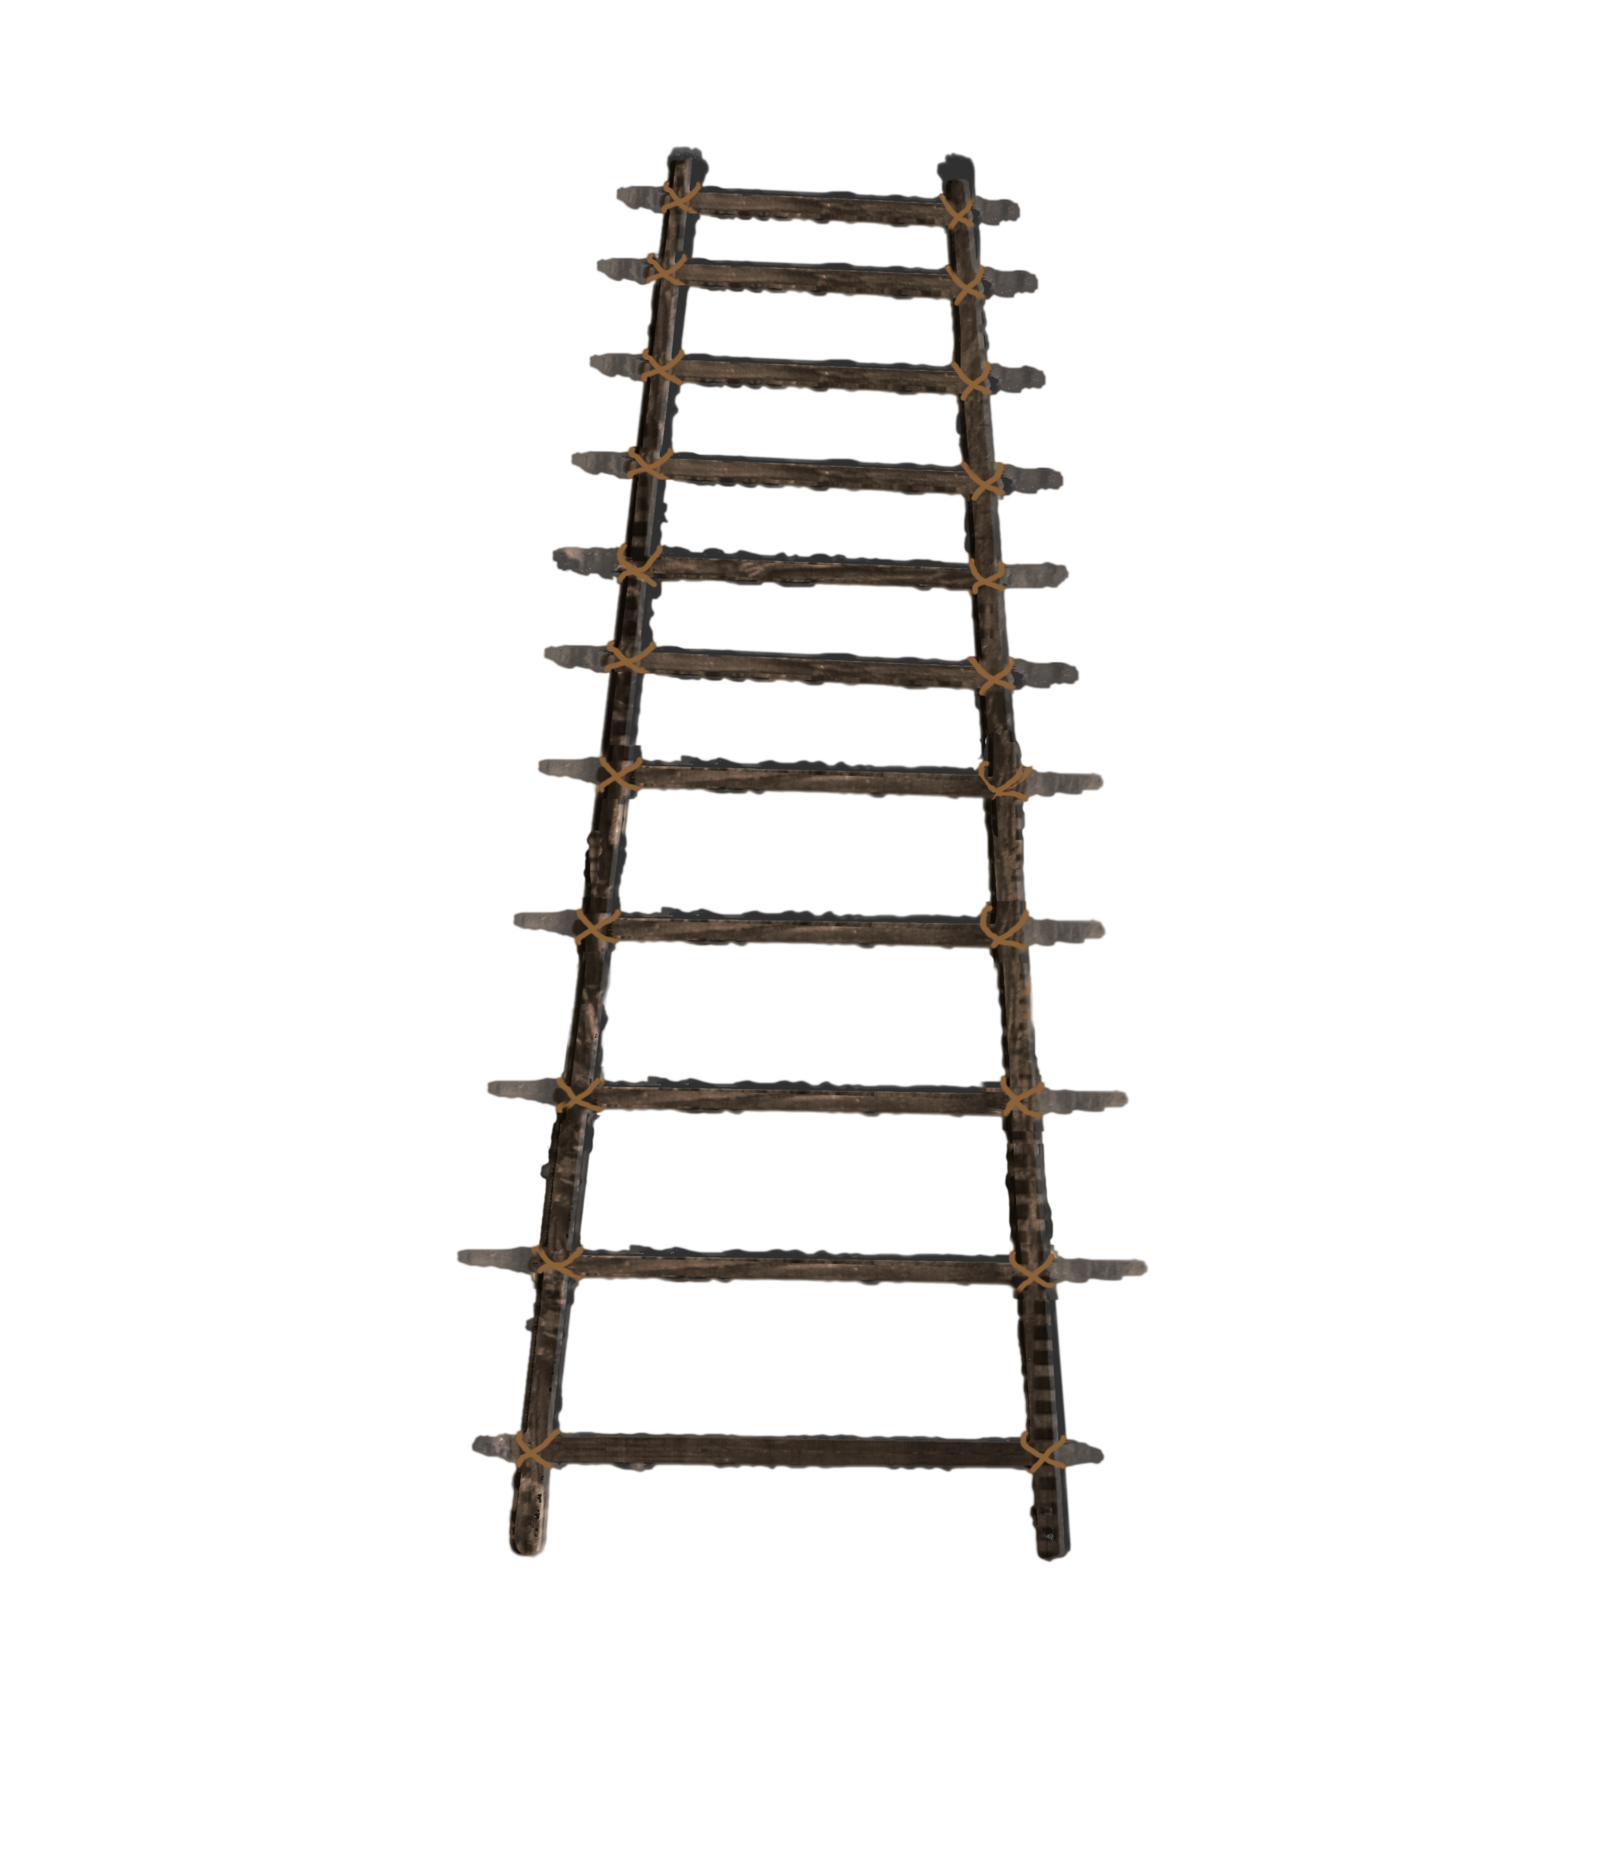 best rope transparent. Ladder clipart tall ladder